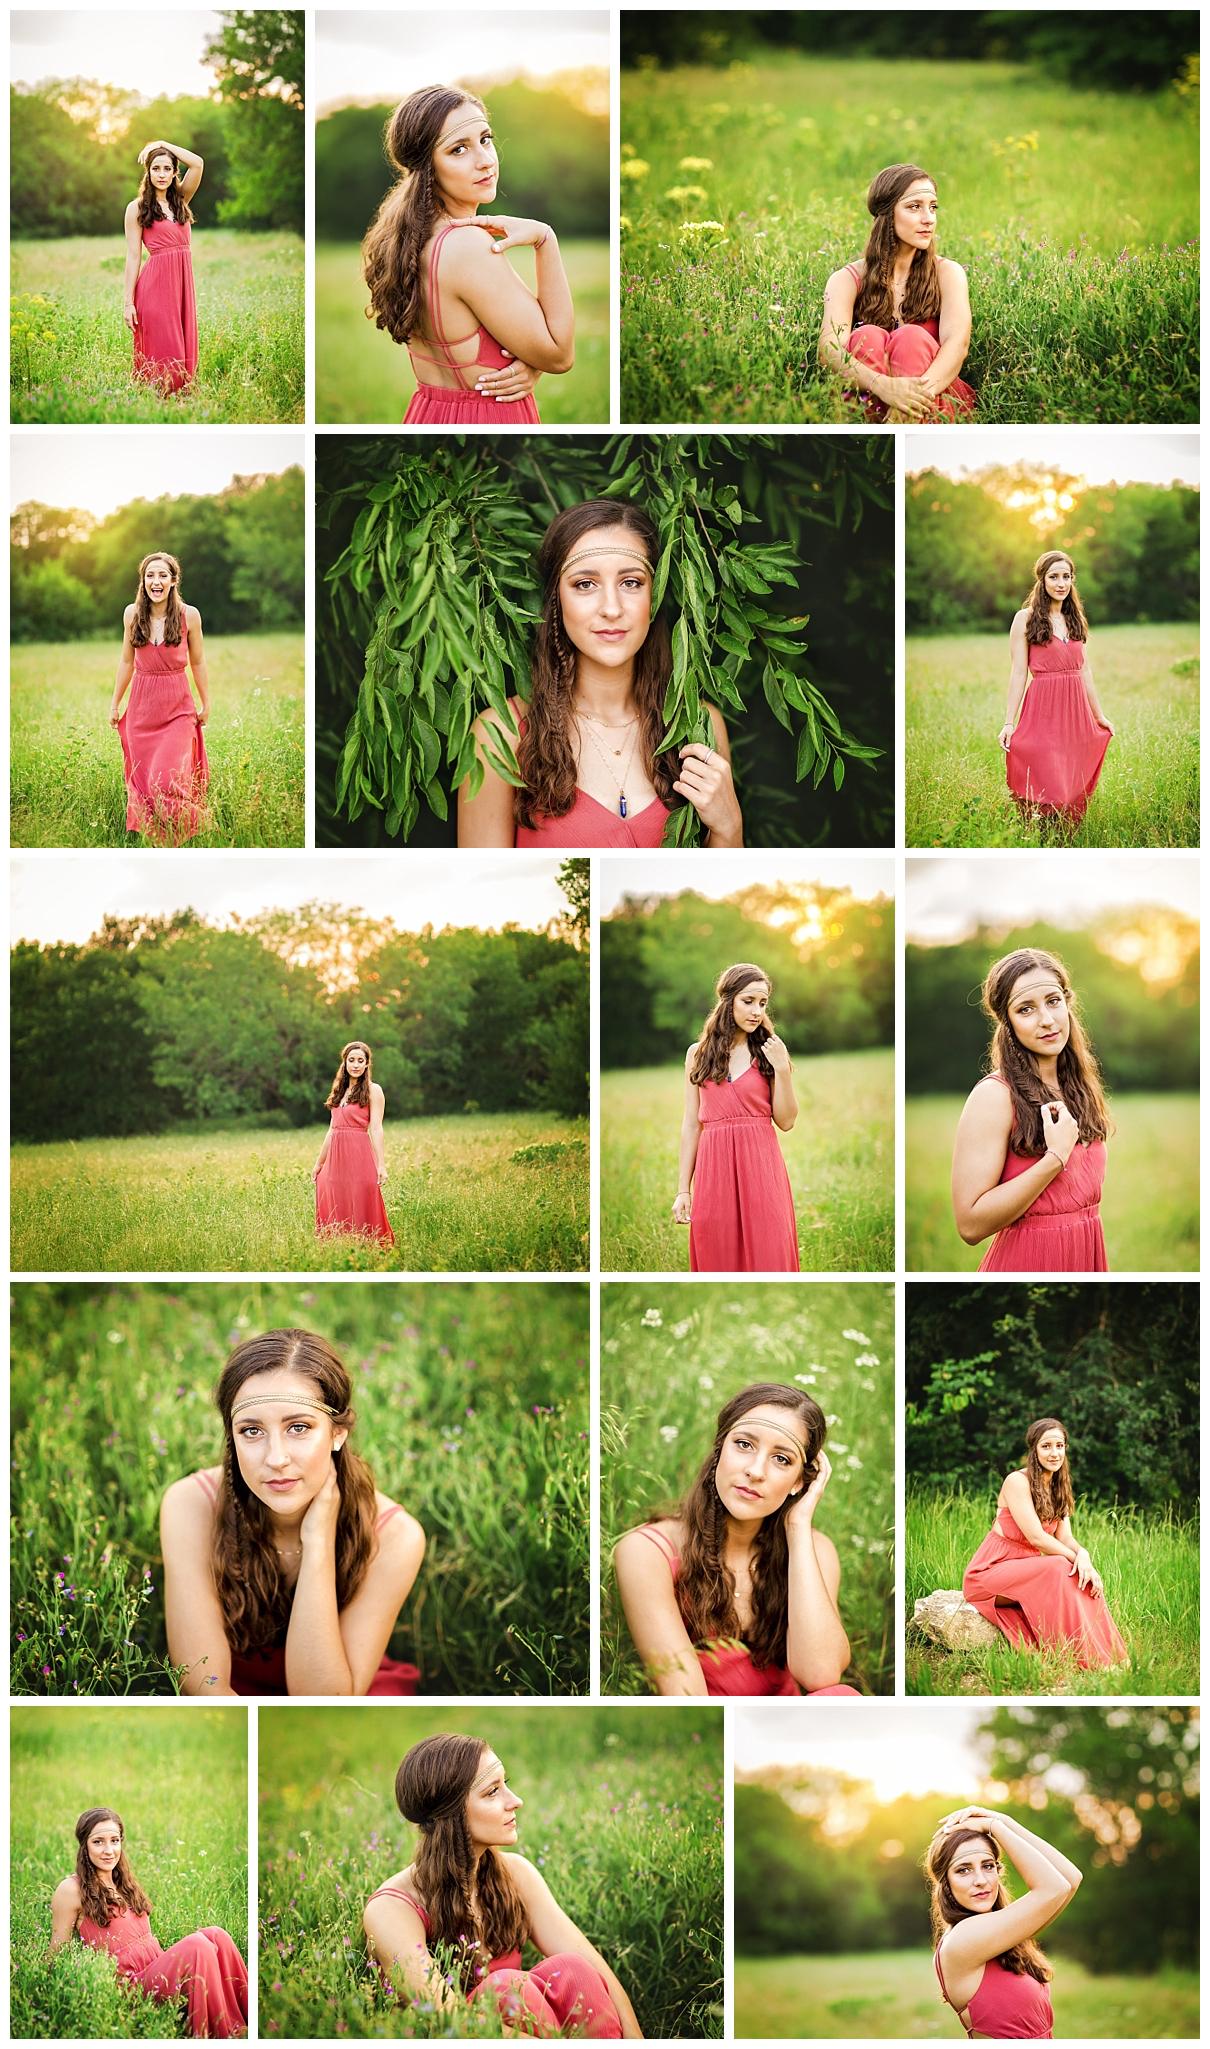 senior-photographer-photography-dfw-fort-worth-texas-tx-high-school-justin-rhome-roanoke-grapevine-keller-southlake-colleyville-denton